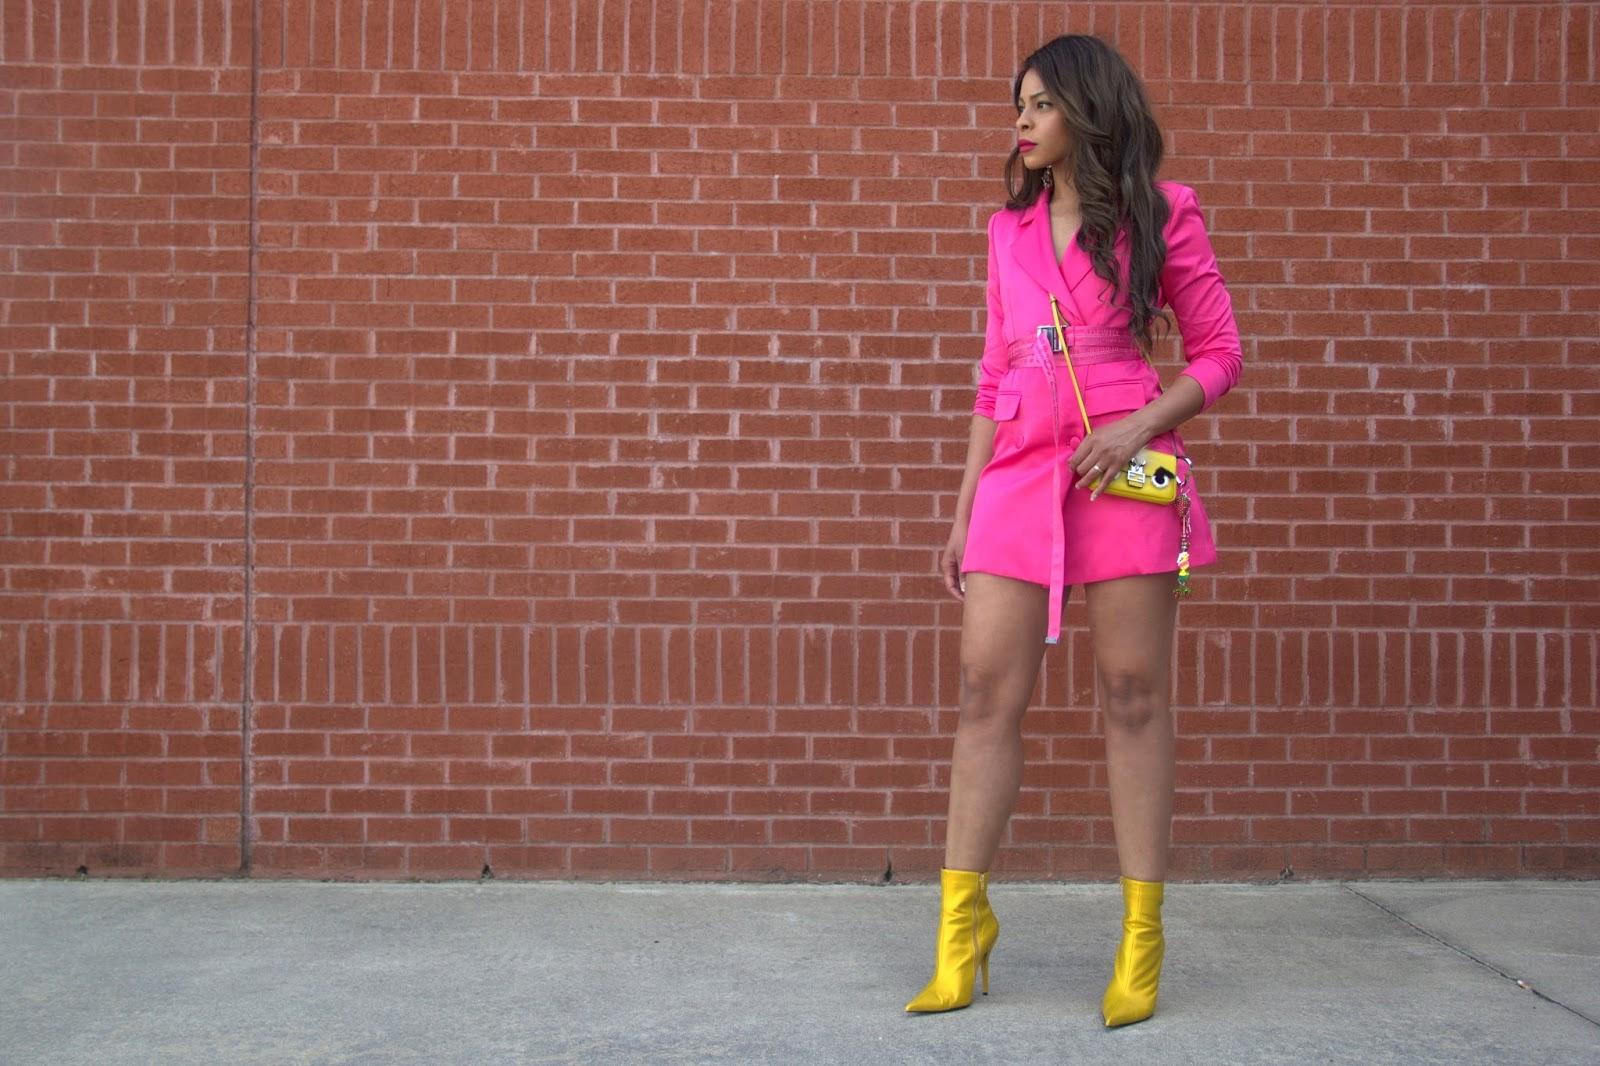 shayla drake greene, allthingsslim, black fashion blogger